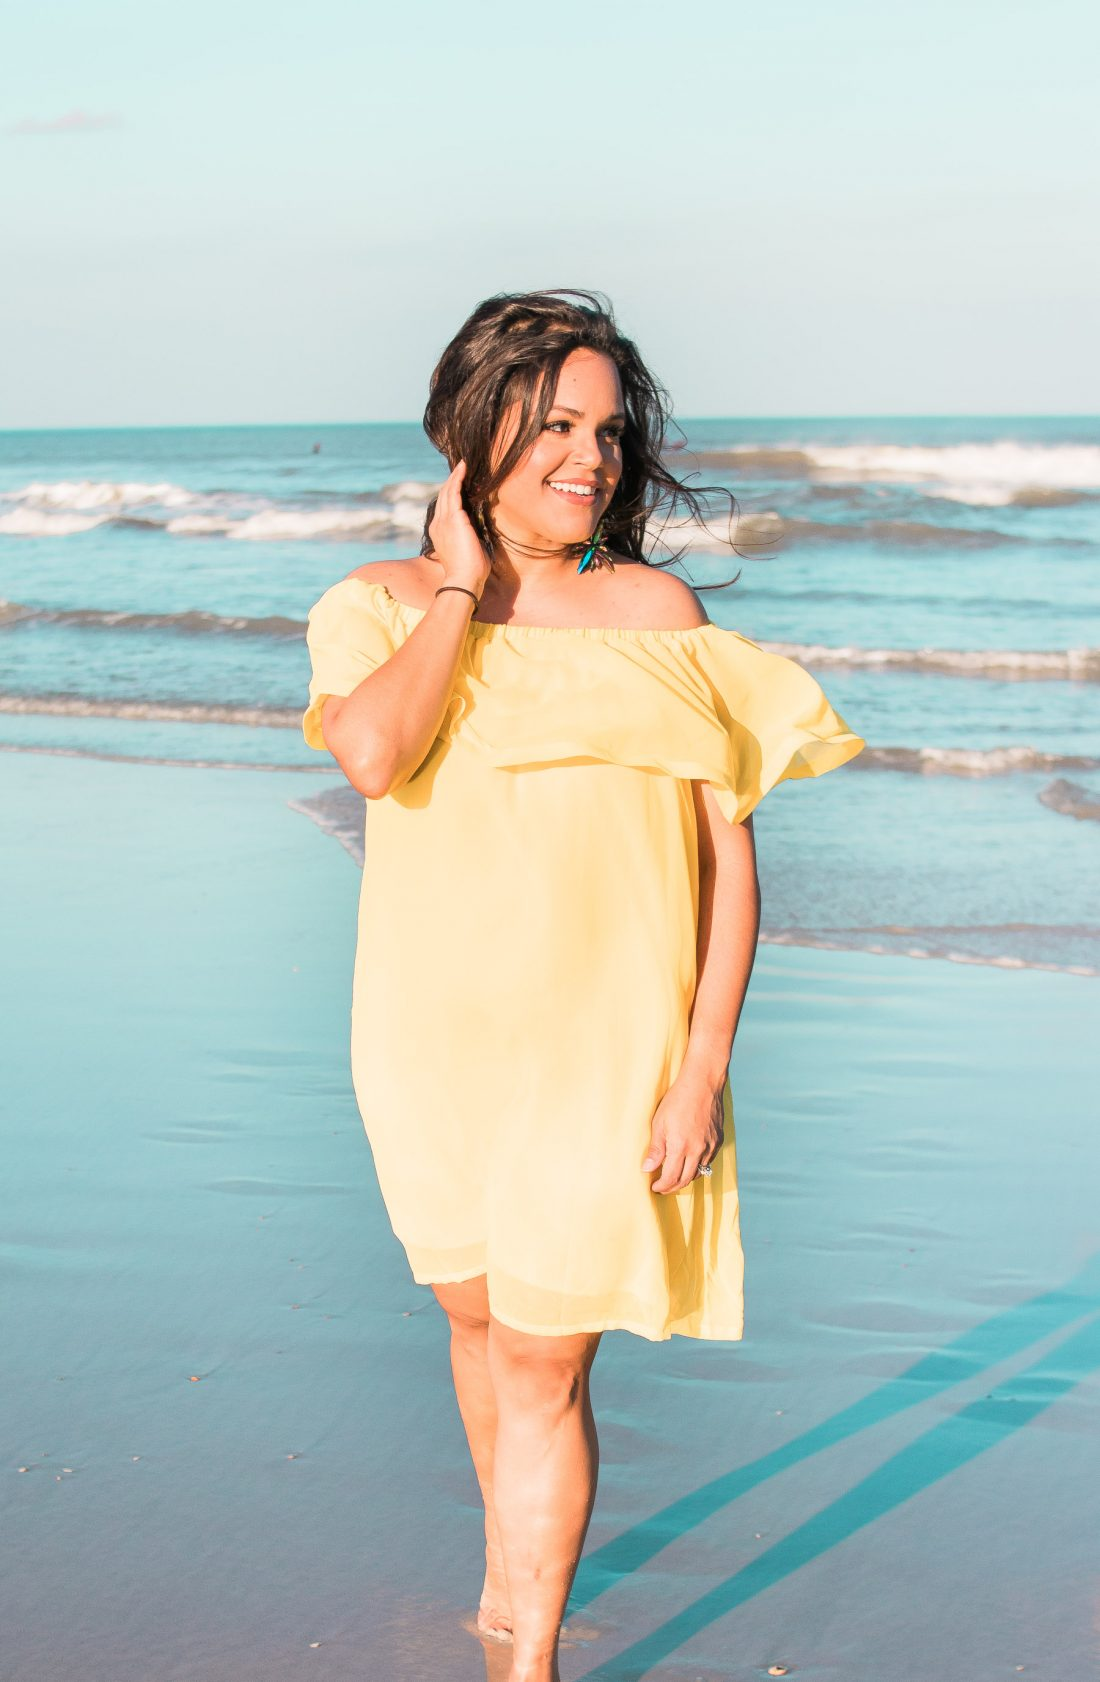 brunette woman standing on beach wearing yellow sundress